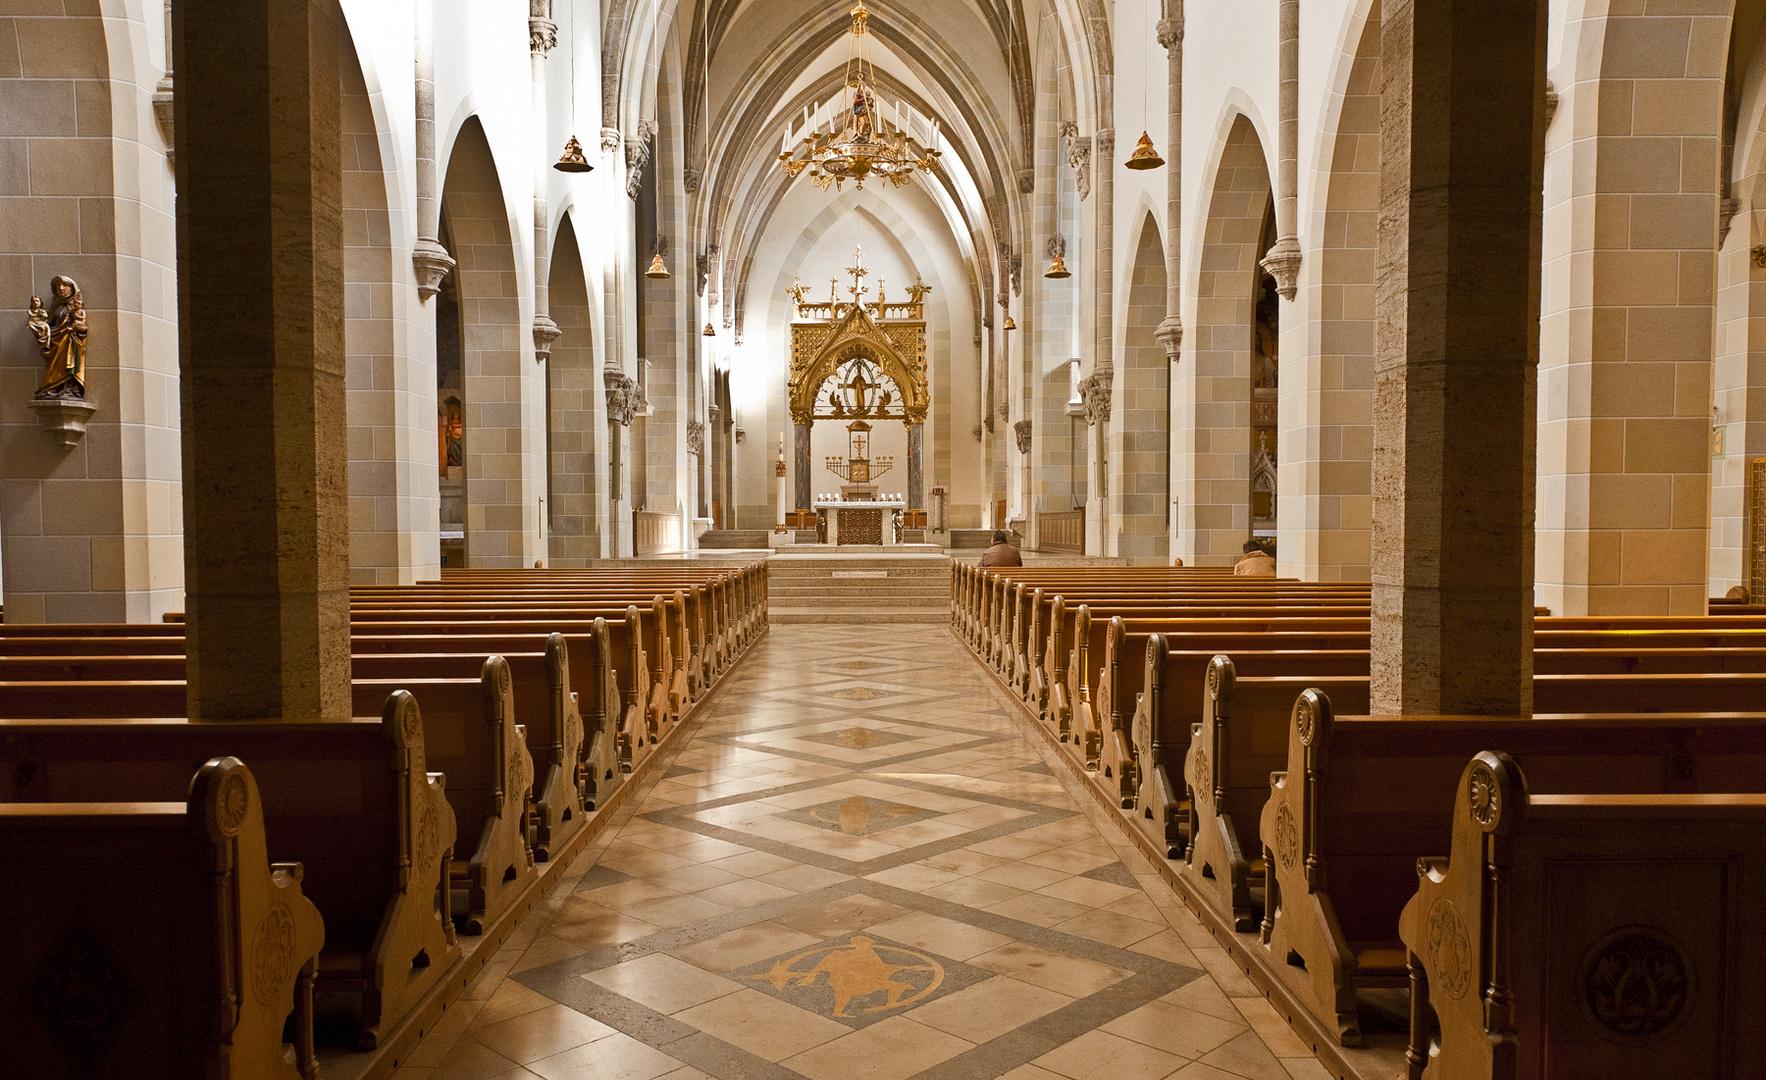 Der Beter - Erzabtei St. Ottilien